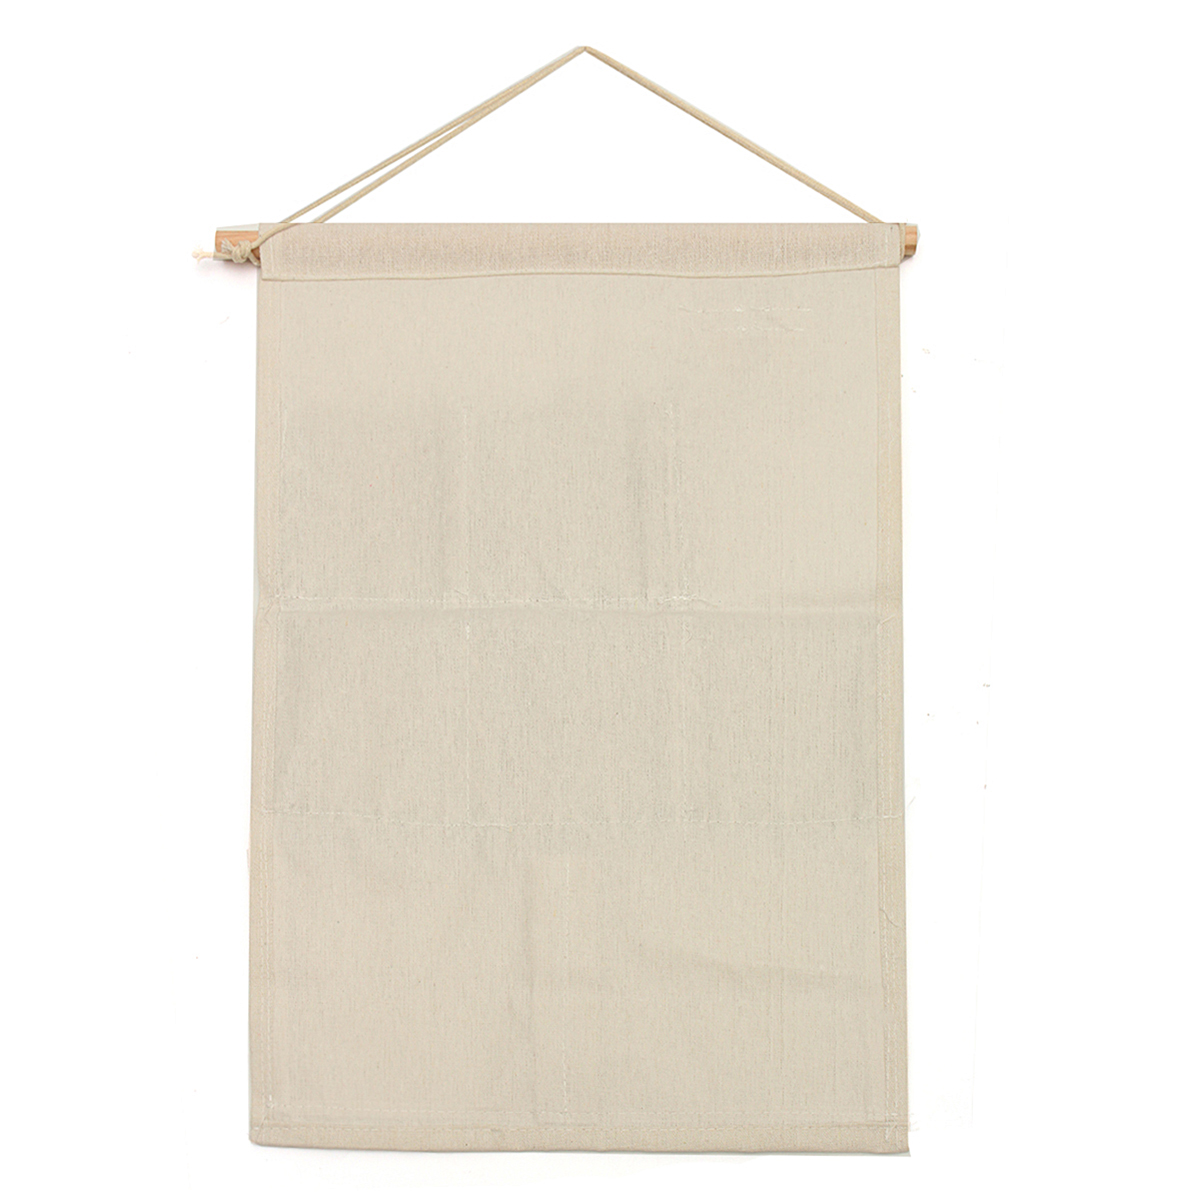 3 Pockets Storage Bag Hanging Storage Bag Home Organizer Hanging Storage Bag Case Gray Wall Door Closet Hanging Storage Bag Organizer Storage Pockets